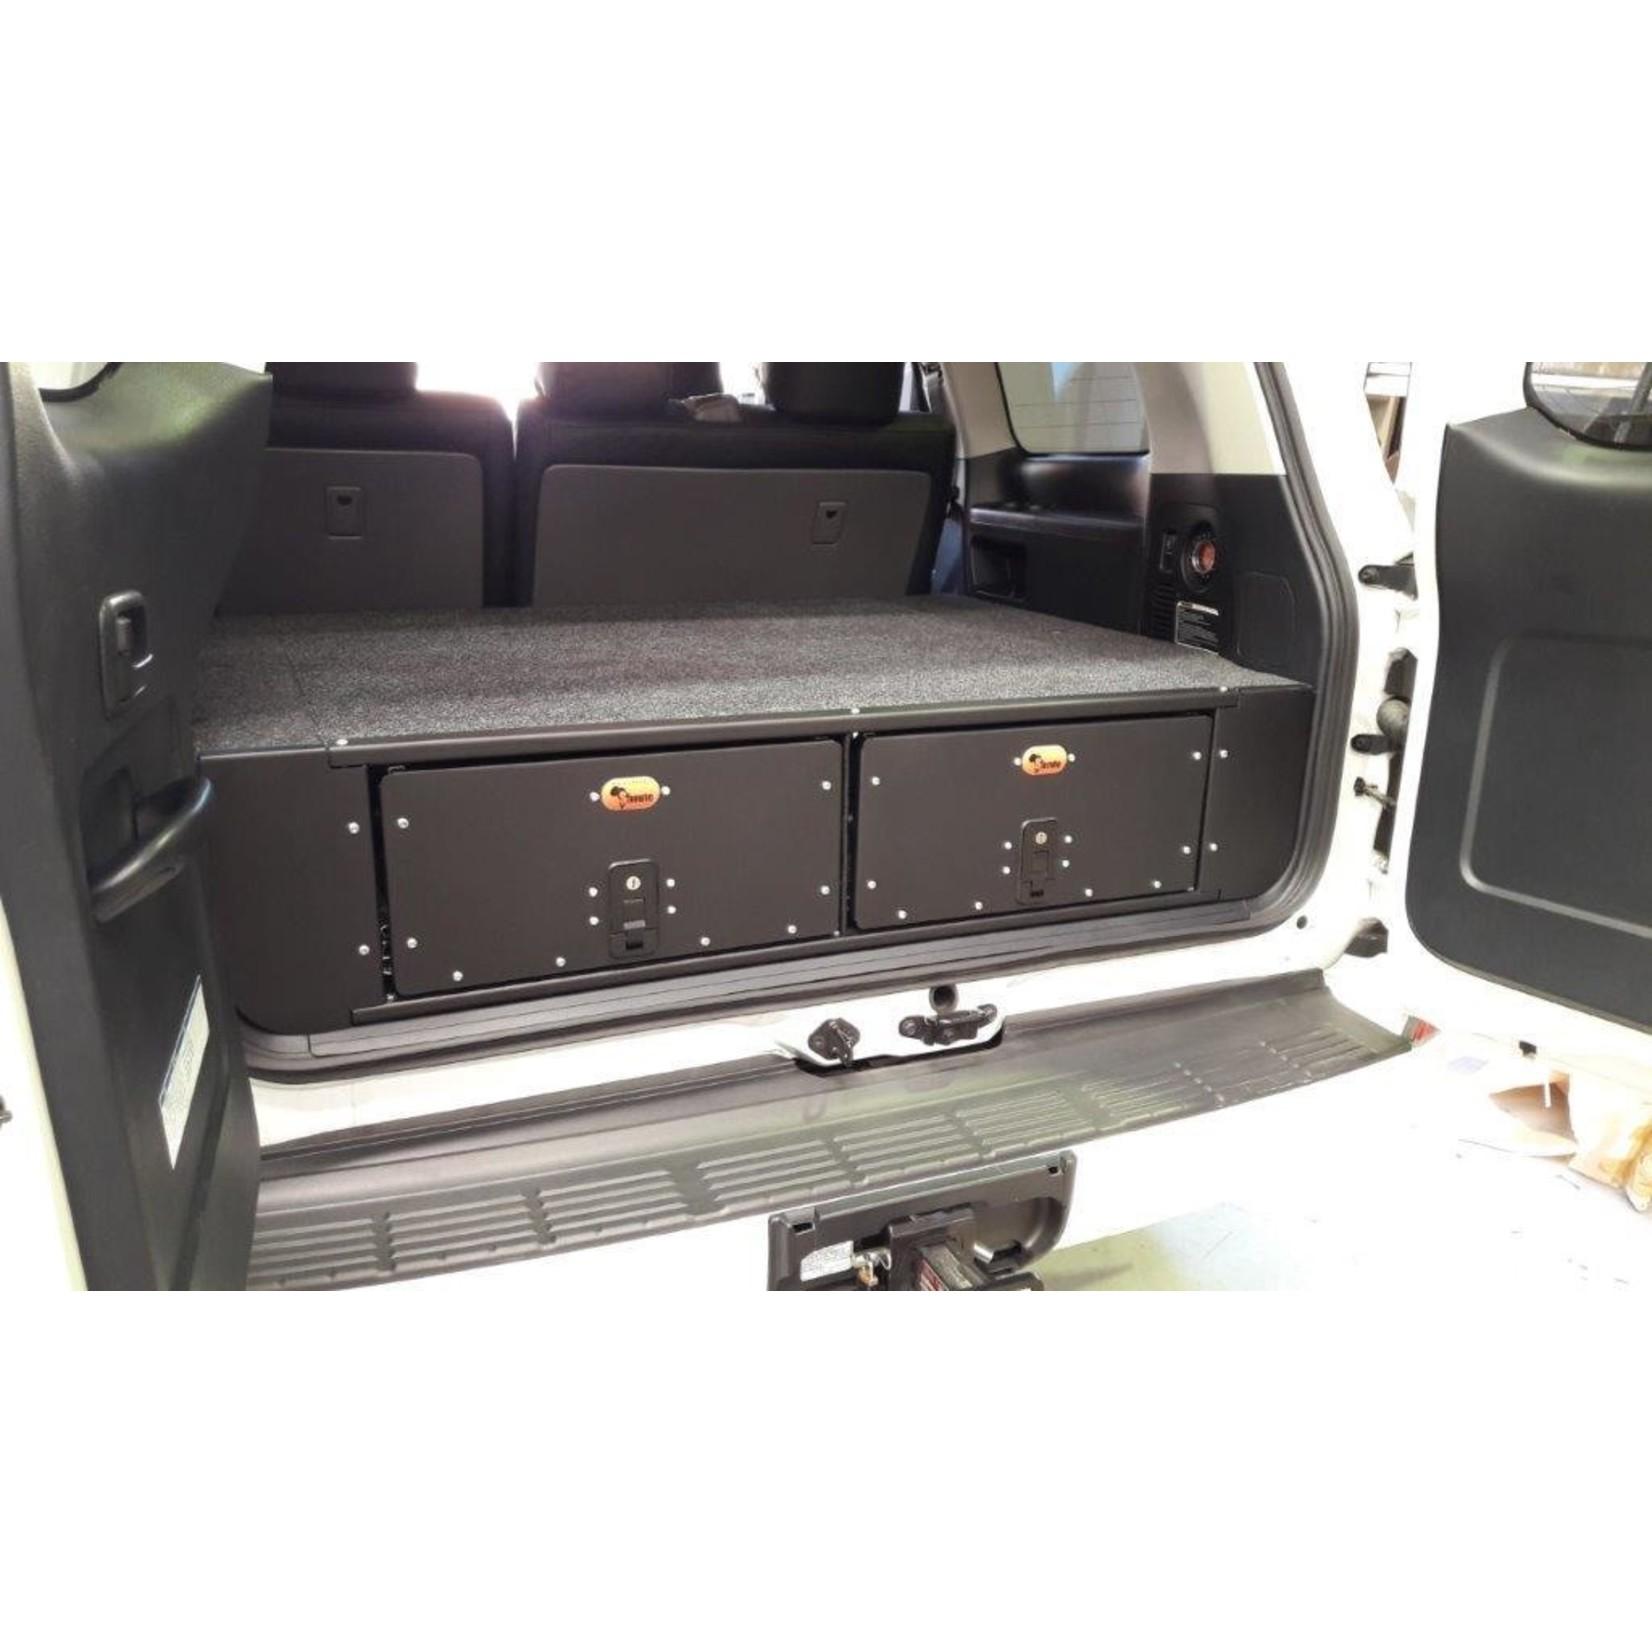 Big Country 4x4 Big Country 4x4 Toyota Land Cruiser 200/Lexus LX570 Twin Drawer Kit